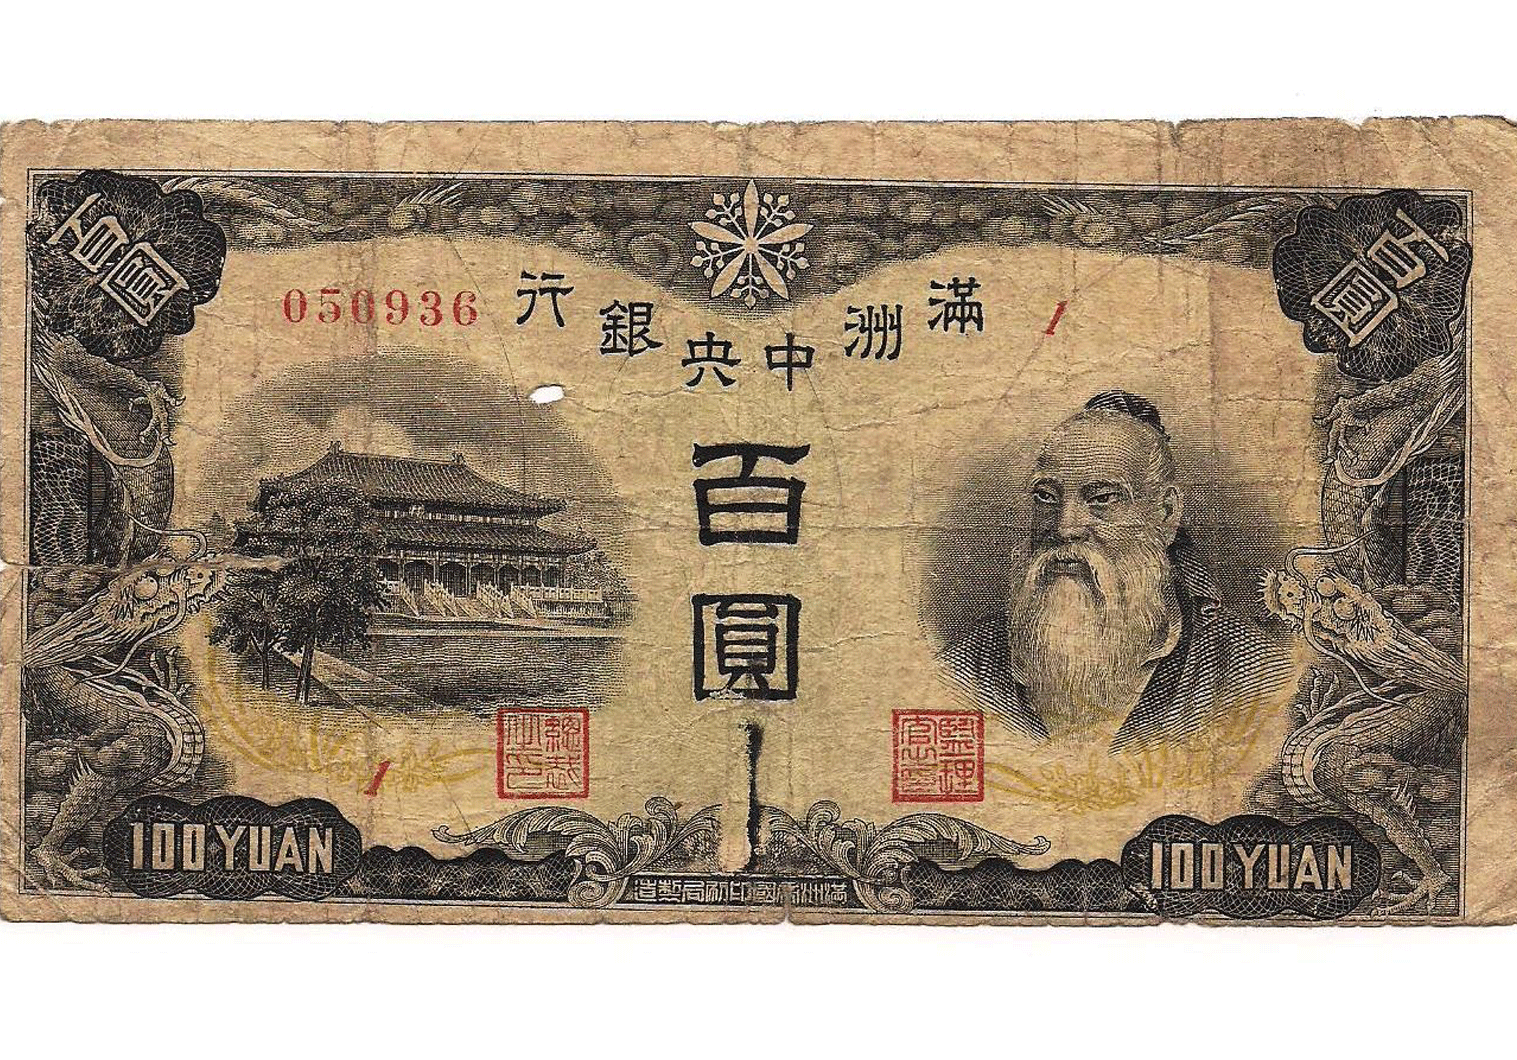 Manchurian banknote